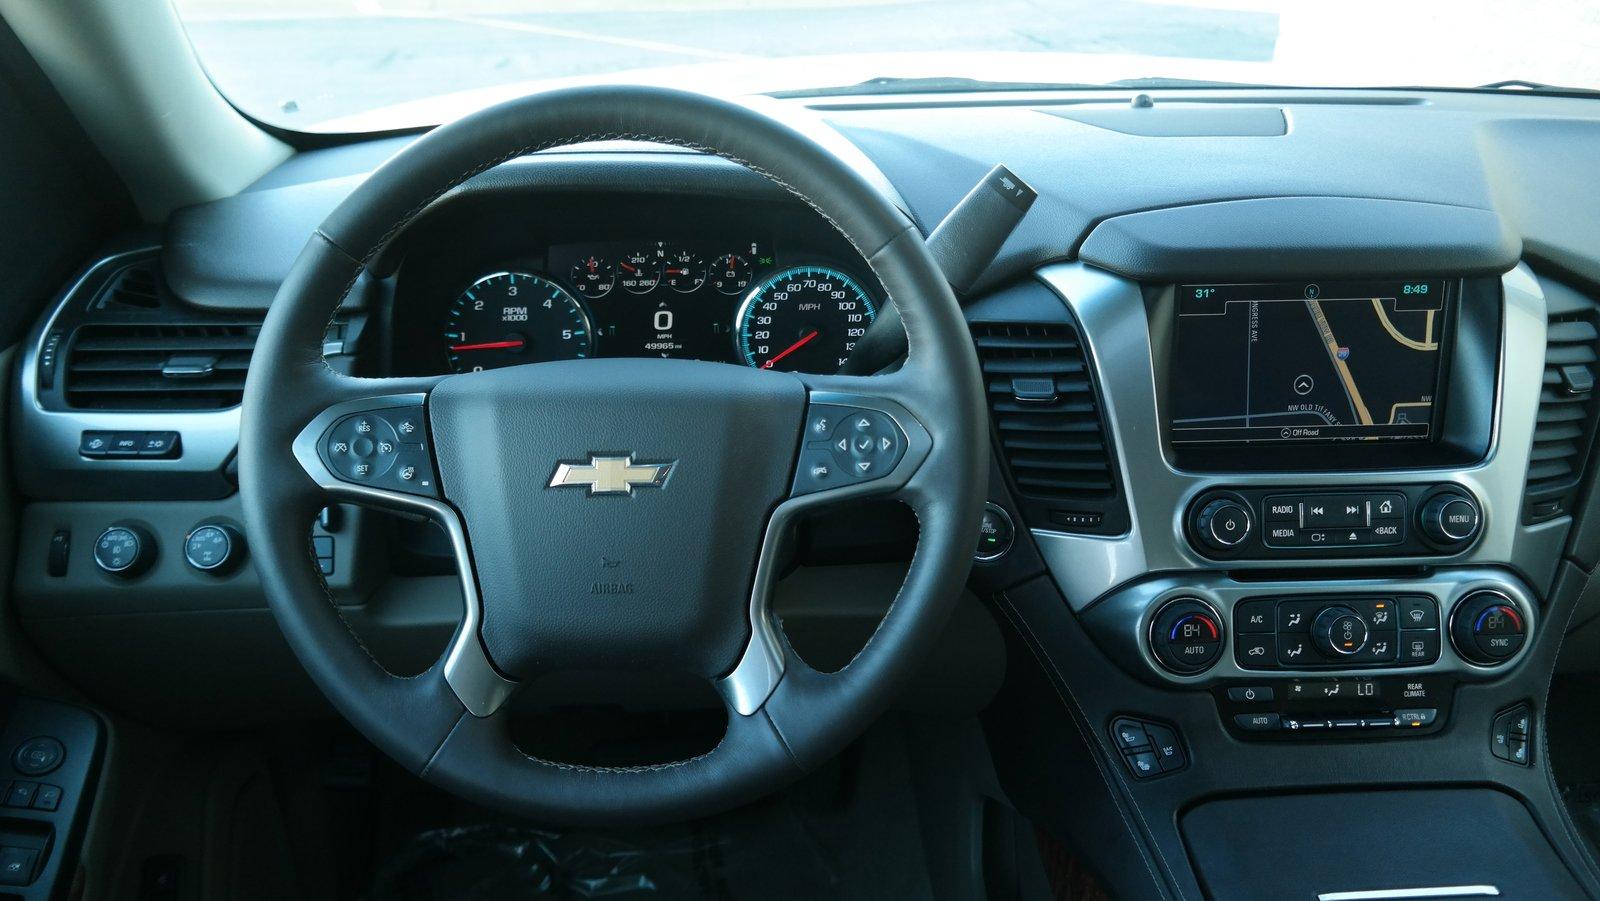 Pre-Owned 2016 Chevrolet Tahoe LTZ